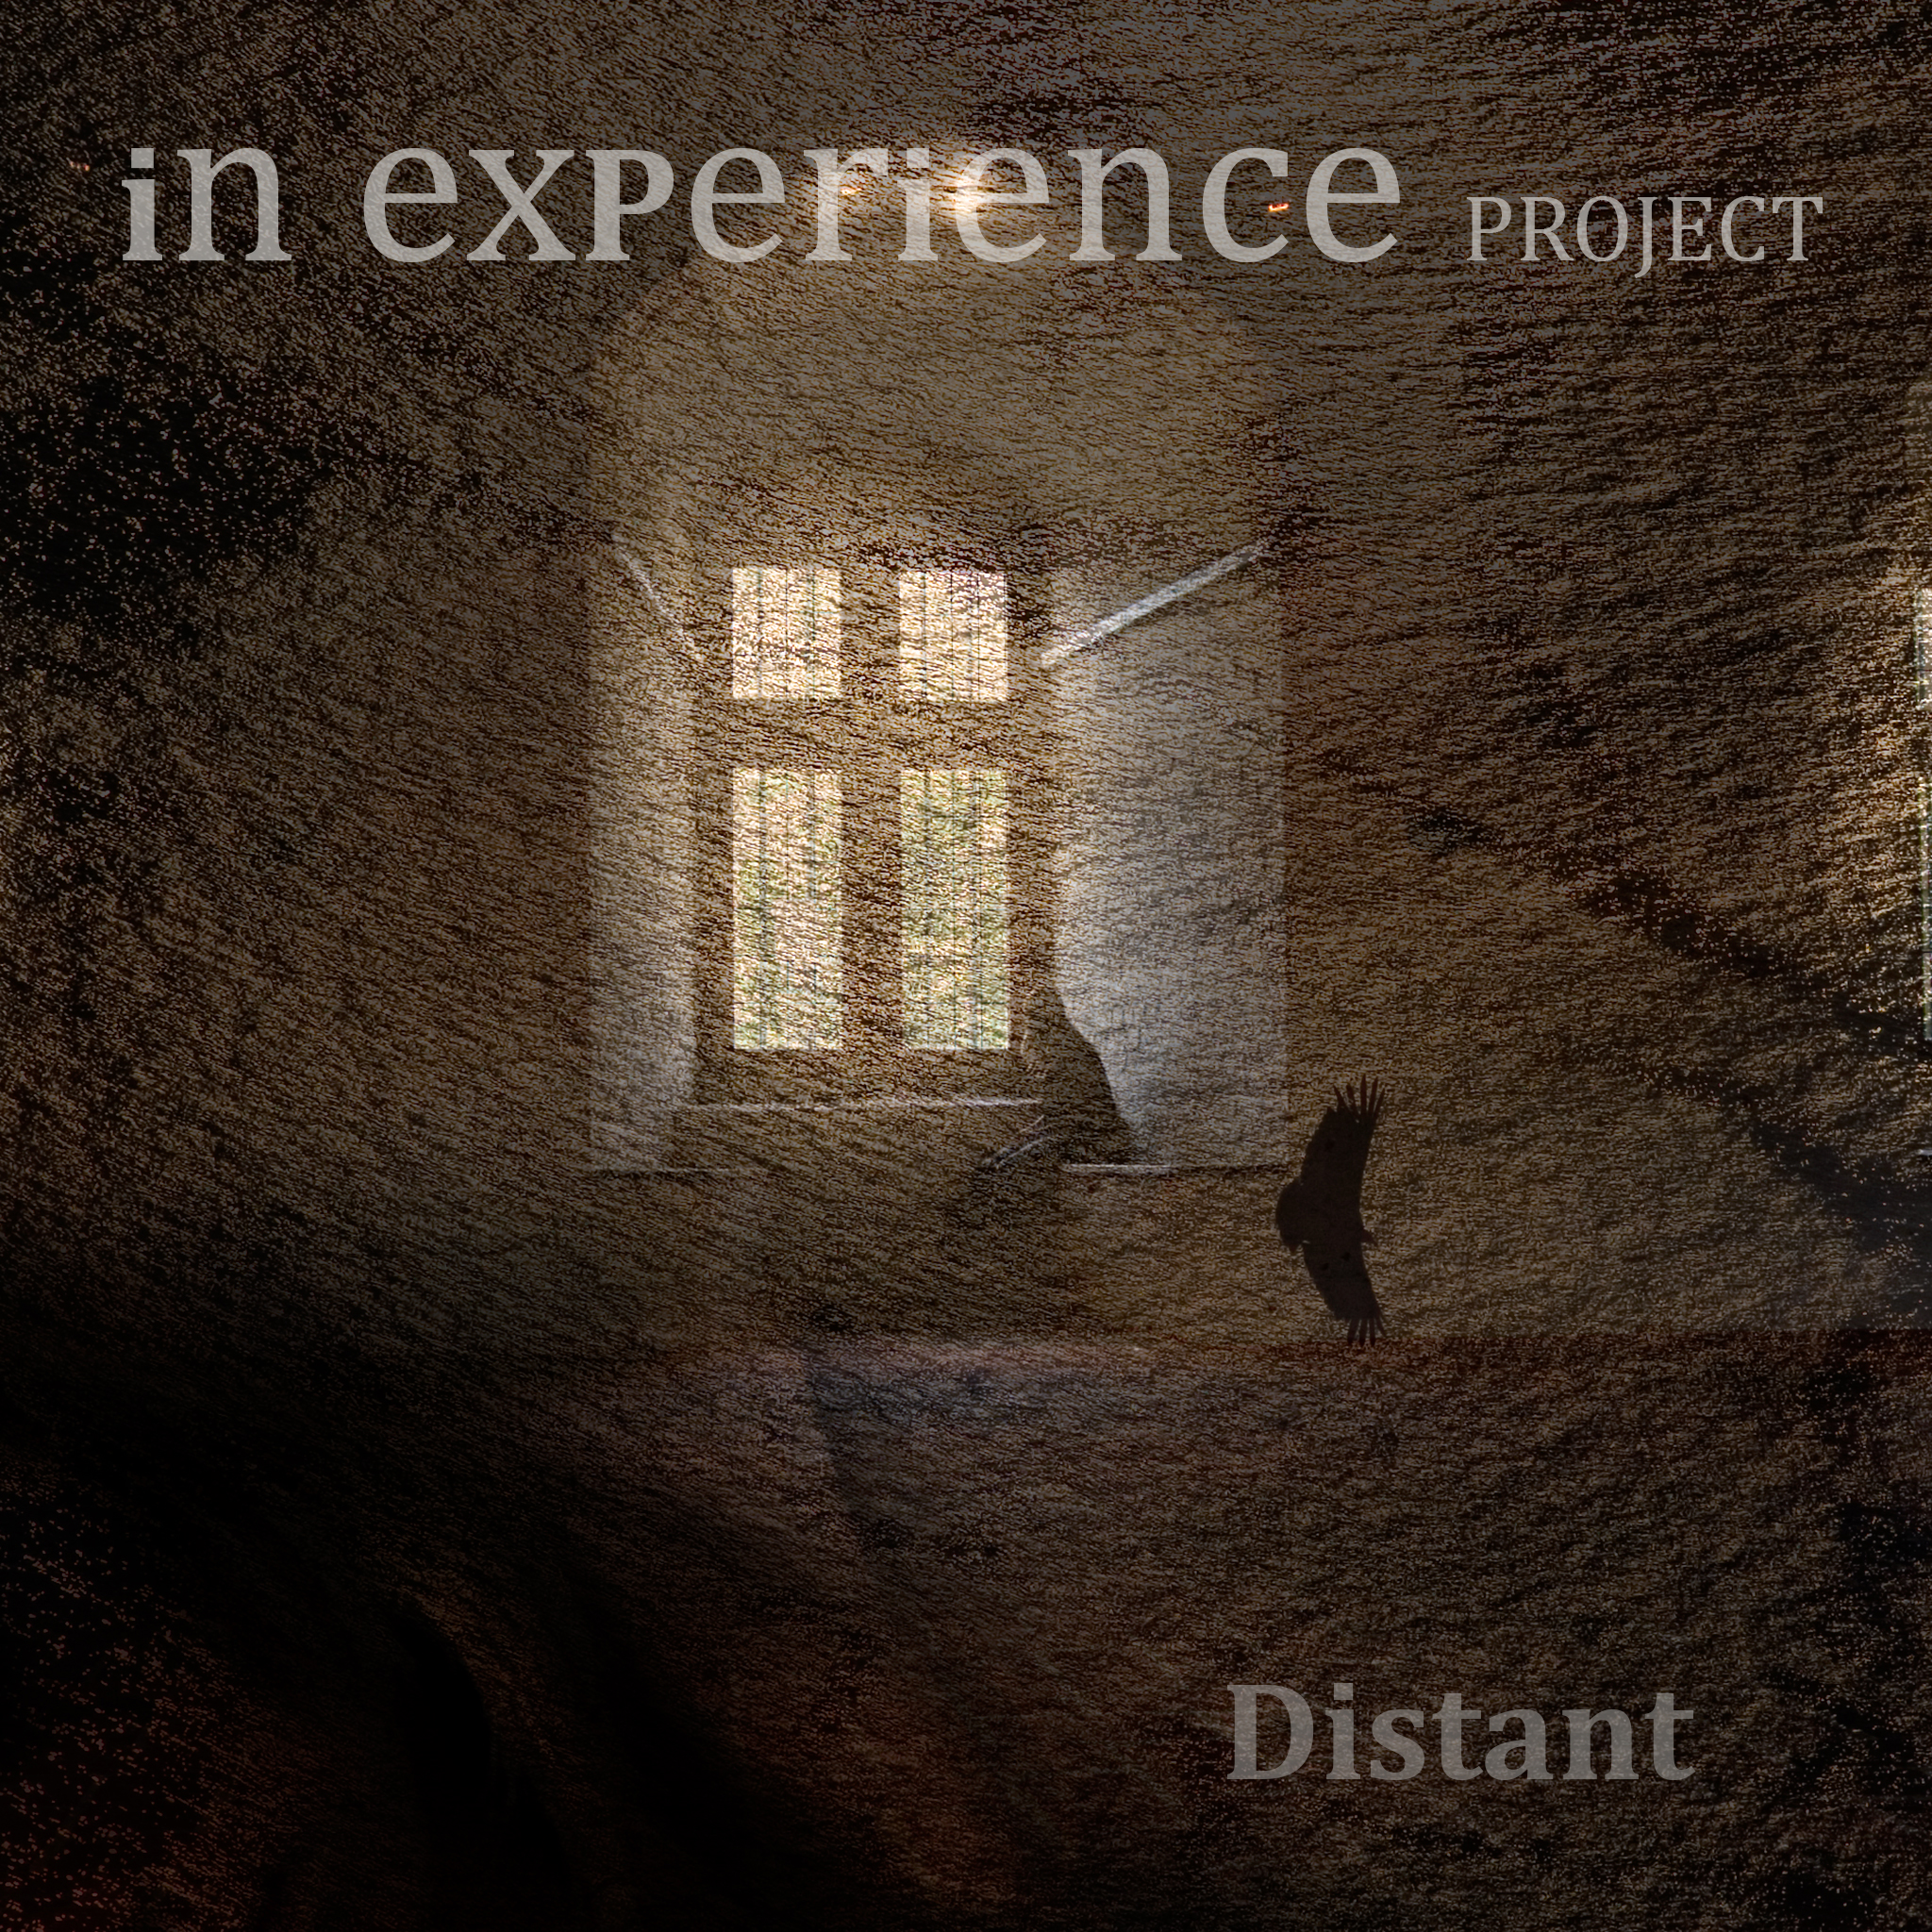 Distant_spotify